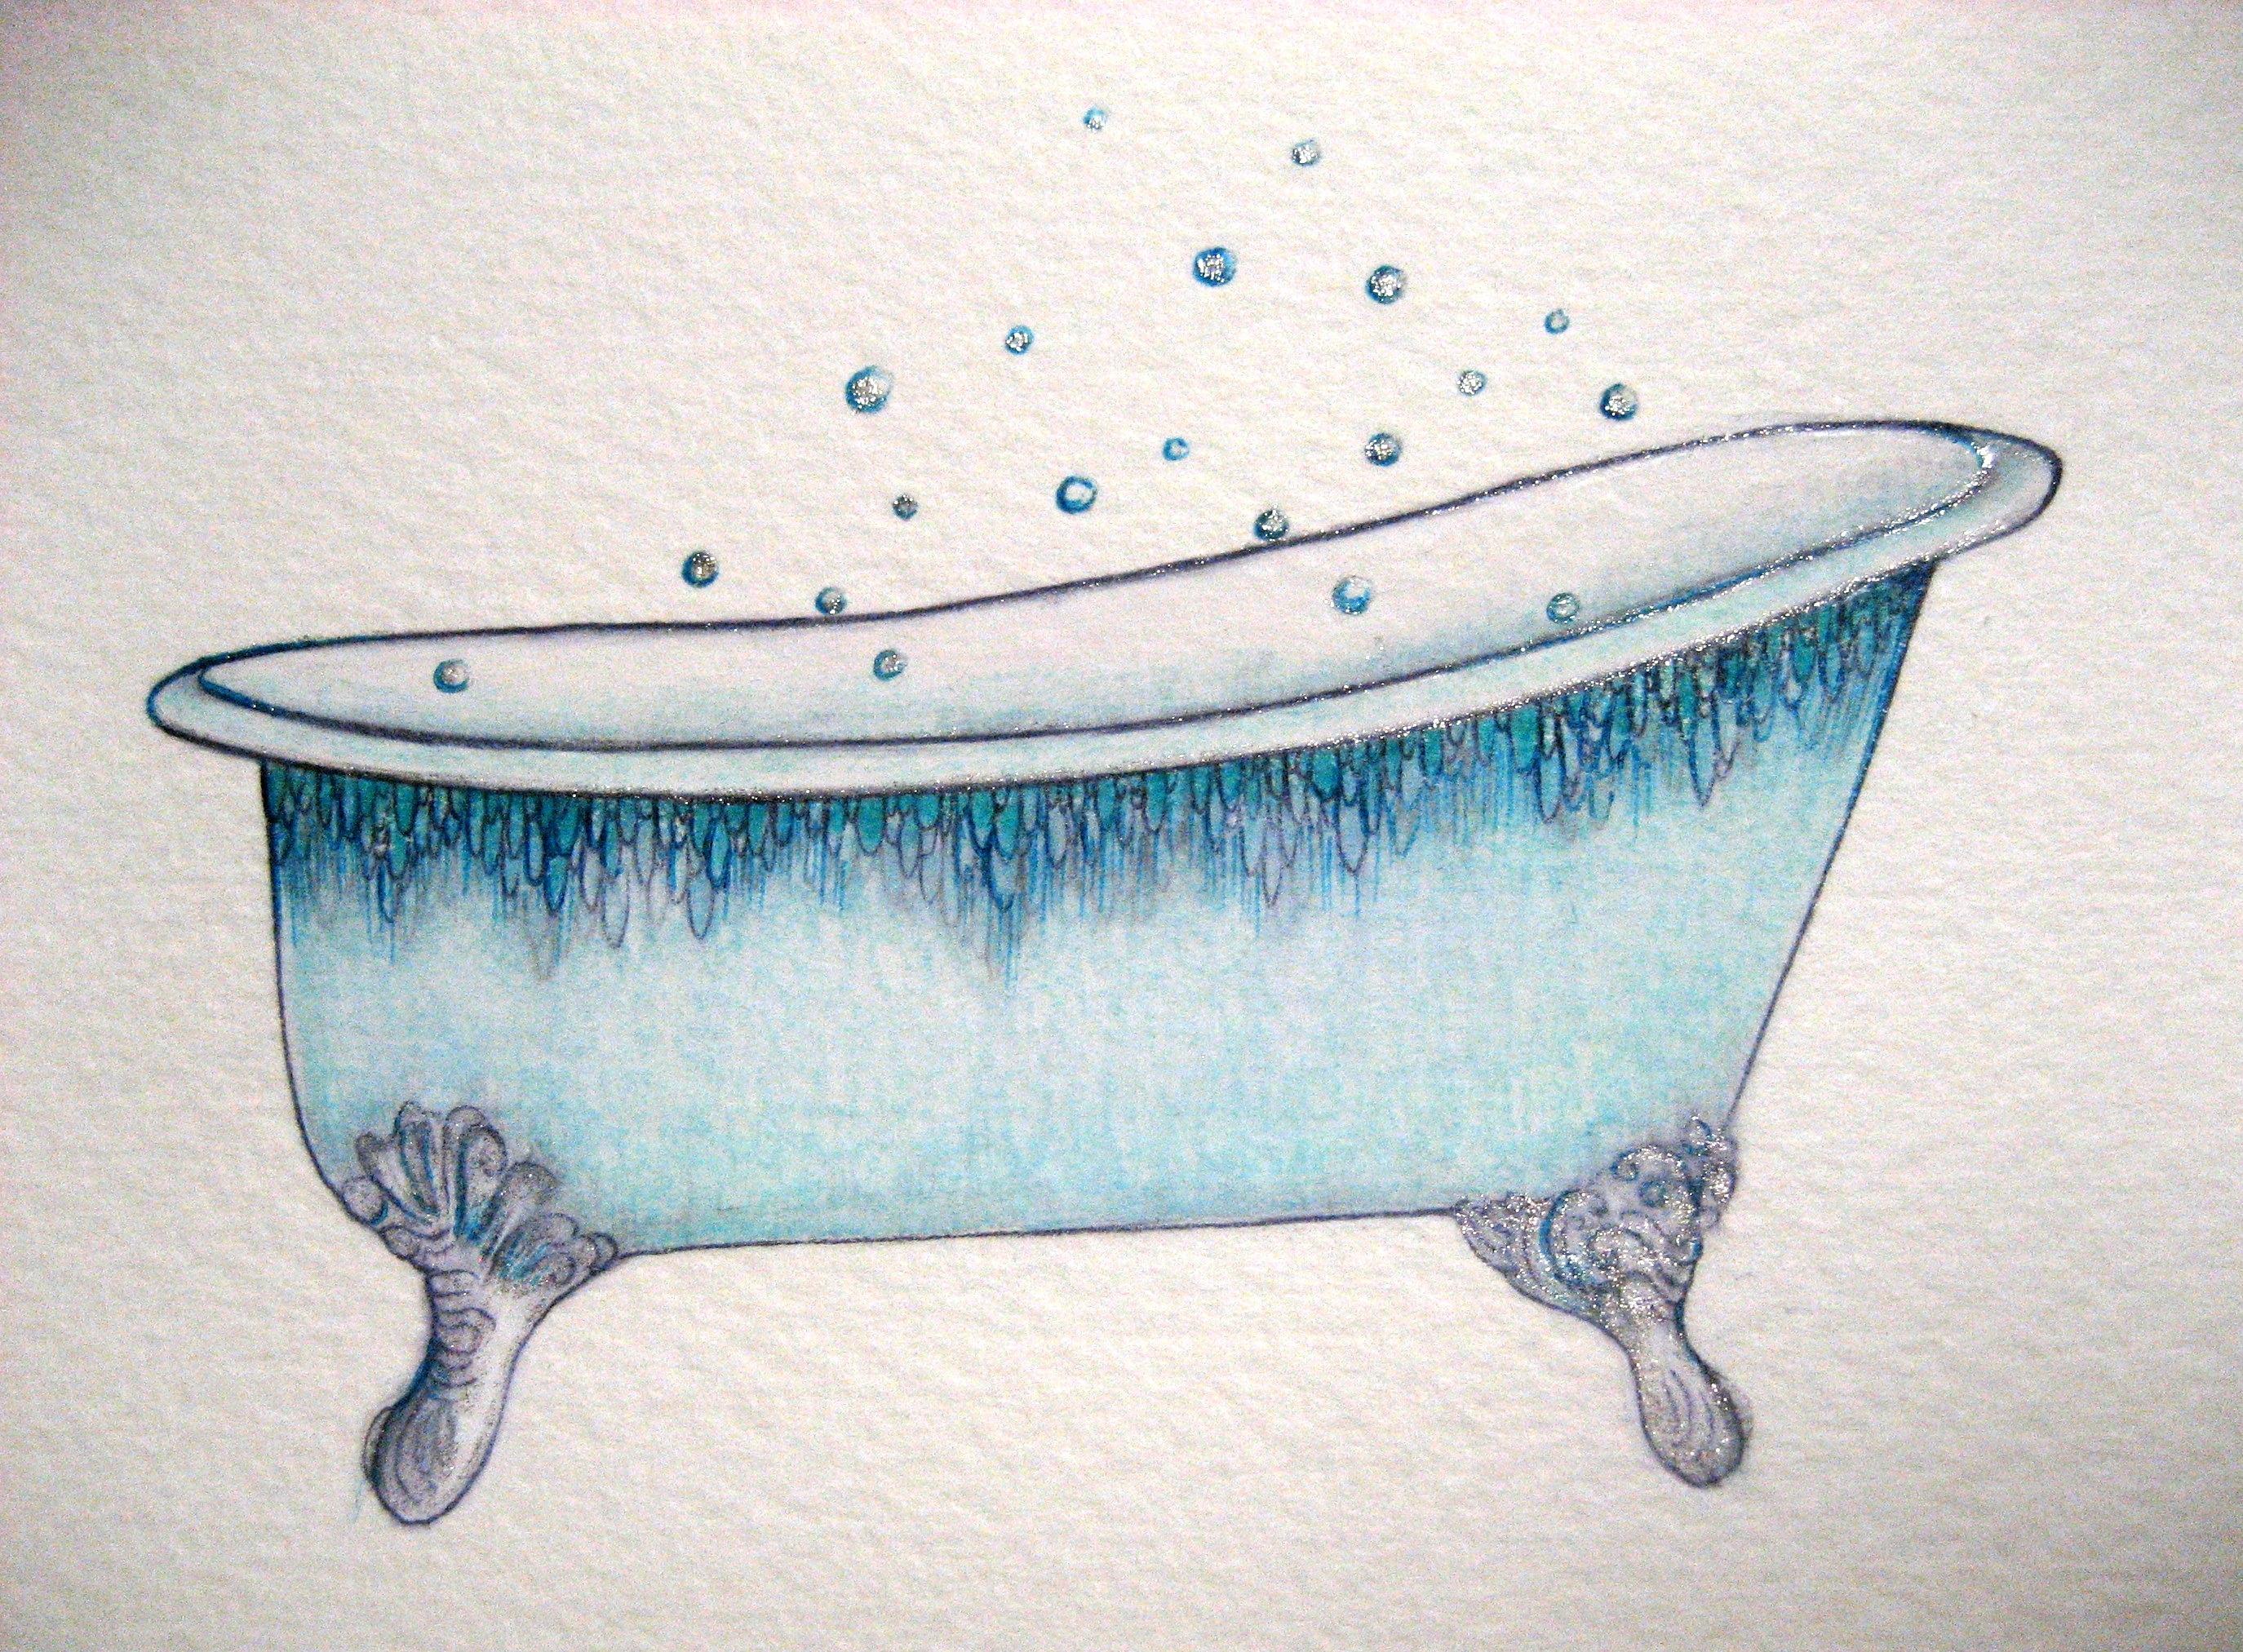 Old fashioned bathtub clipart clipart freeuse Vintage Bathtub Clipart Clipart Suggest Deep Soaking Bathtub clipart freeuse